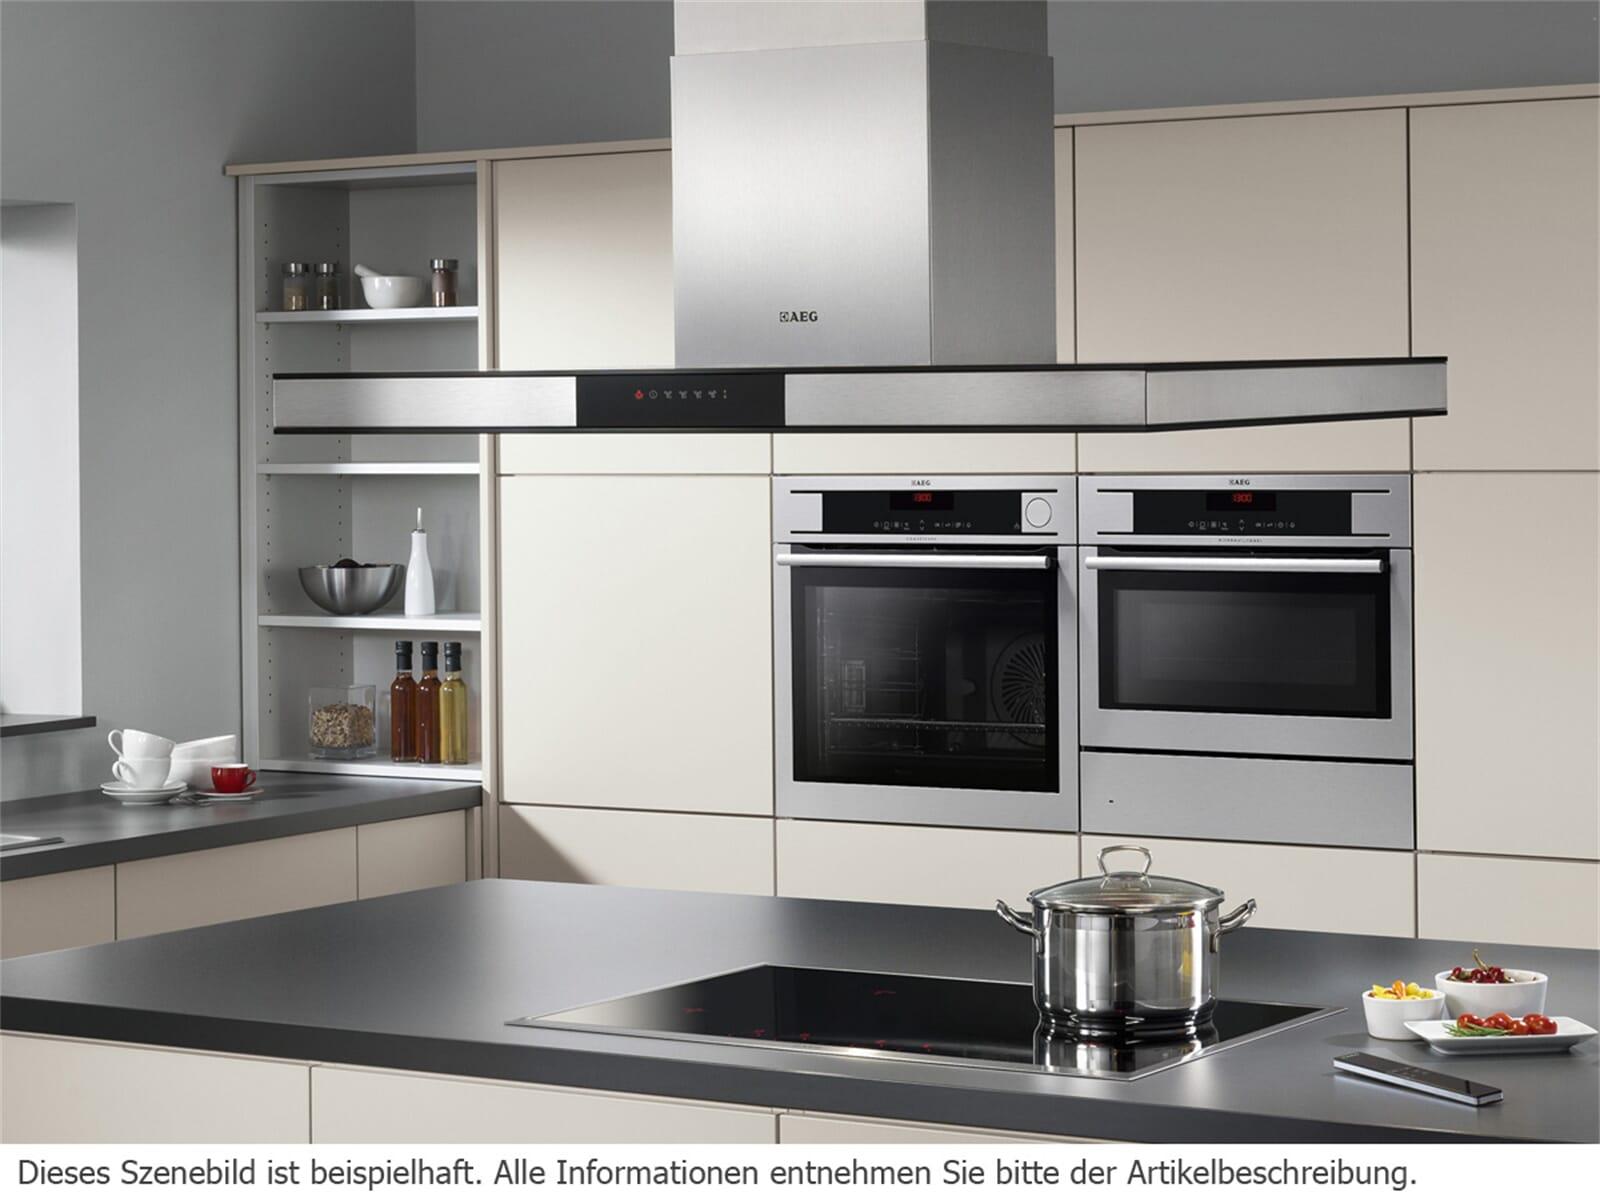 aeg x91484mi1 insel dunstabzugshaube edelstahl f r 678 90 eur. Black Bedroom Furniture Sets. Home Design Ideas